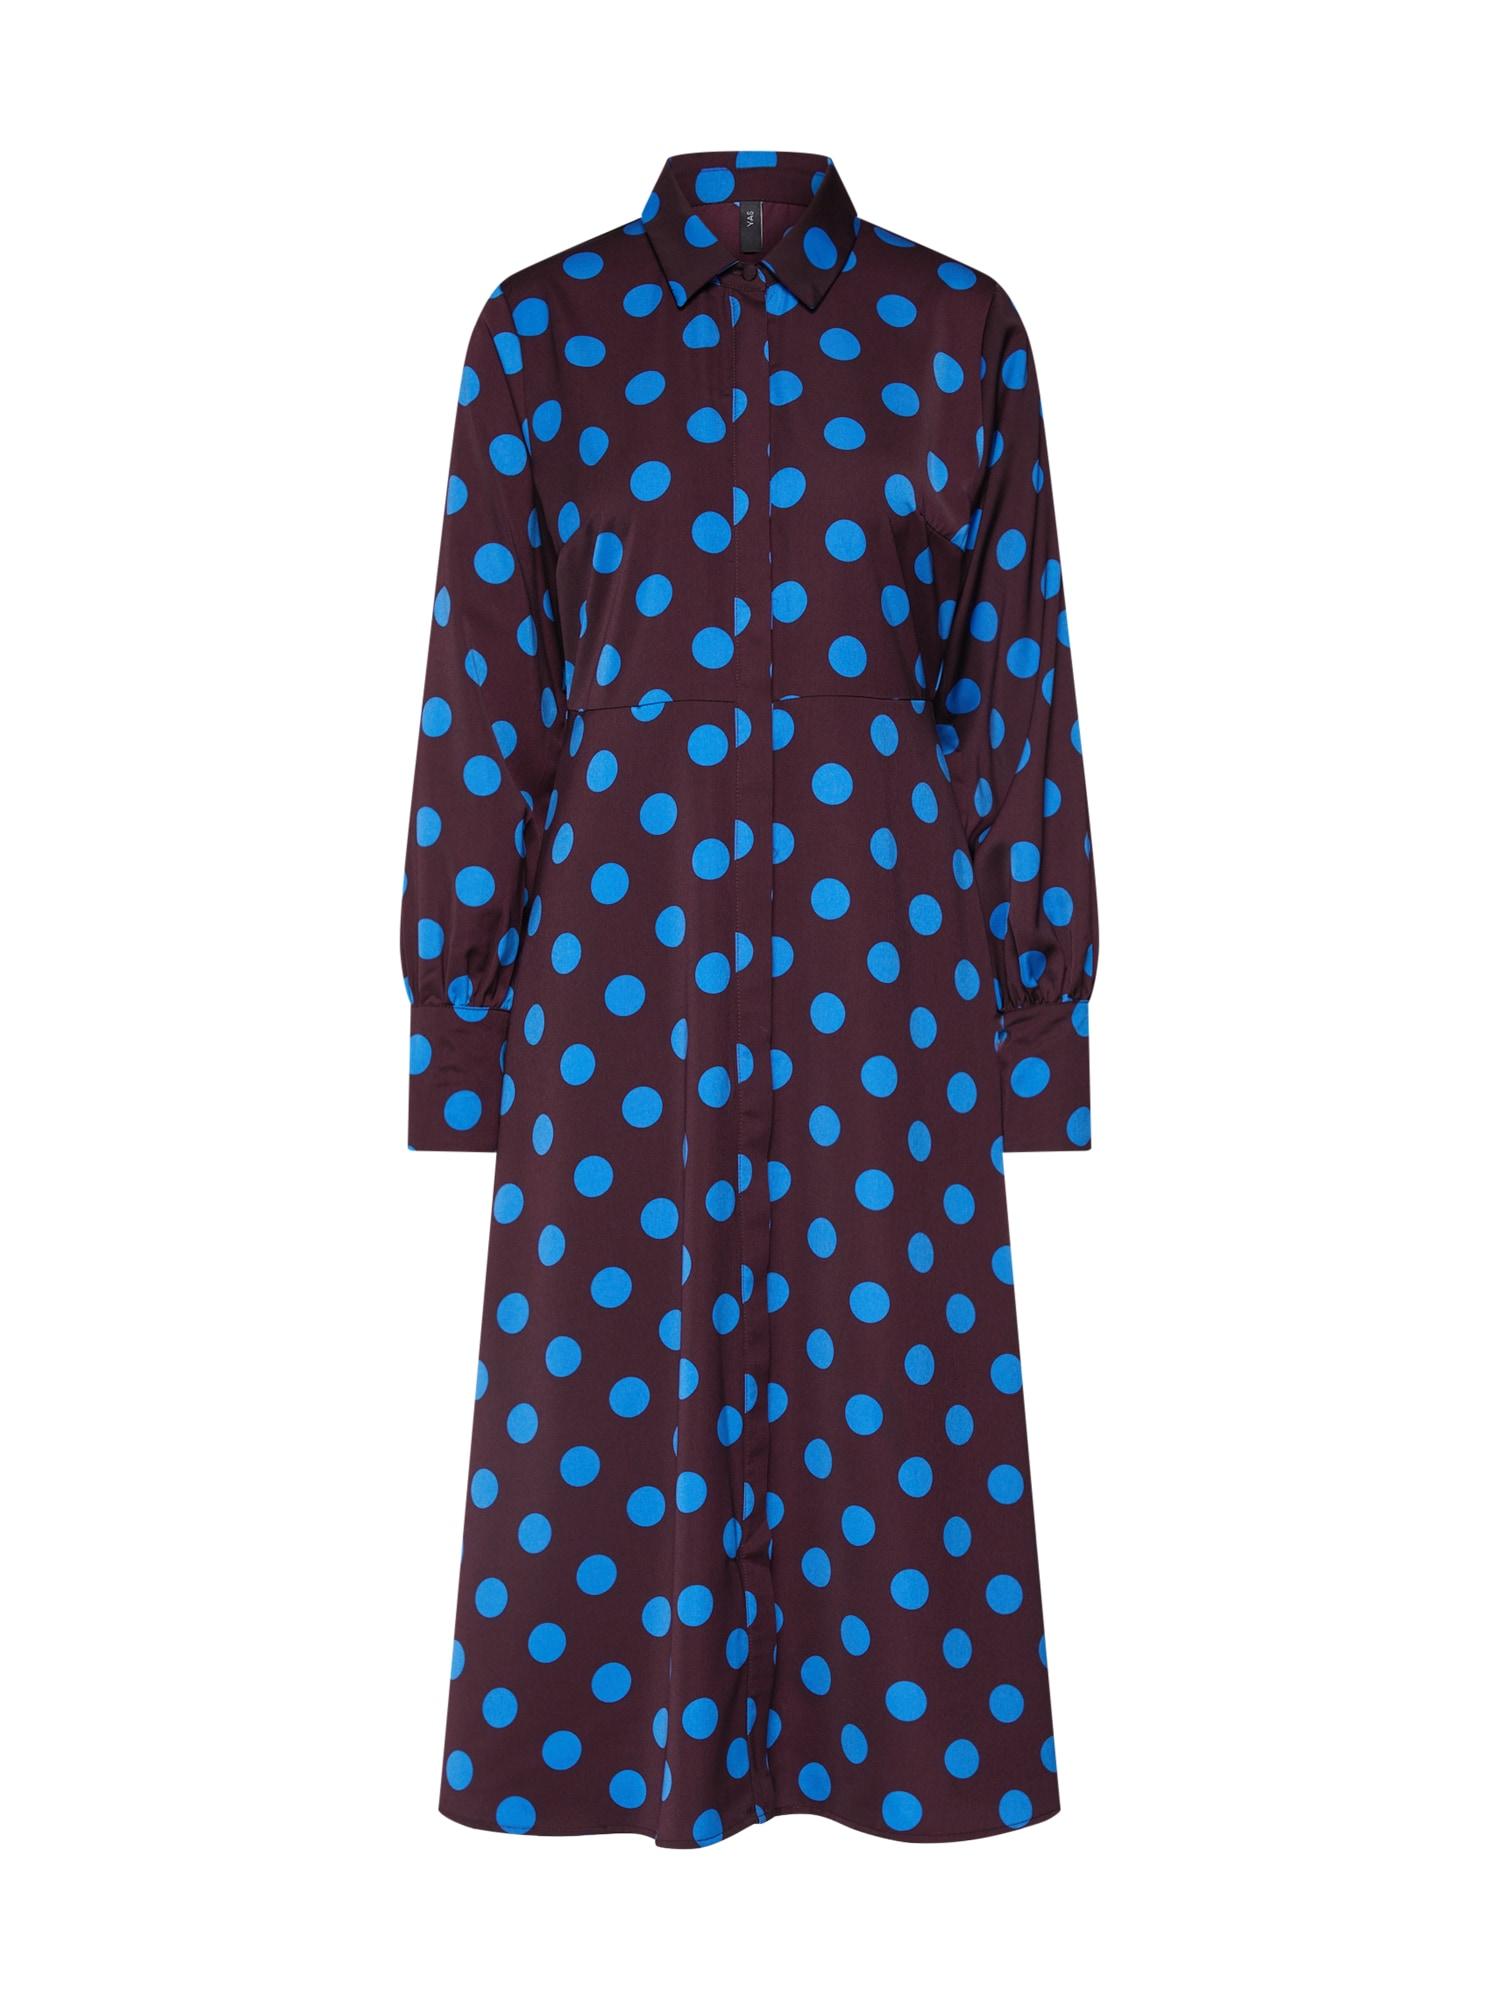 Y.A.S Košeľové šaty 'GWEN'  modré / vínovo červená